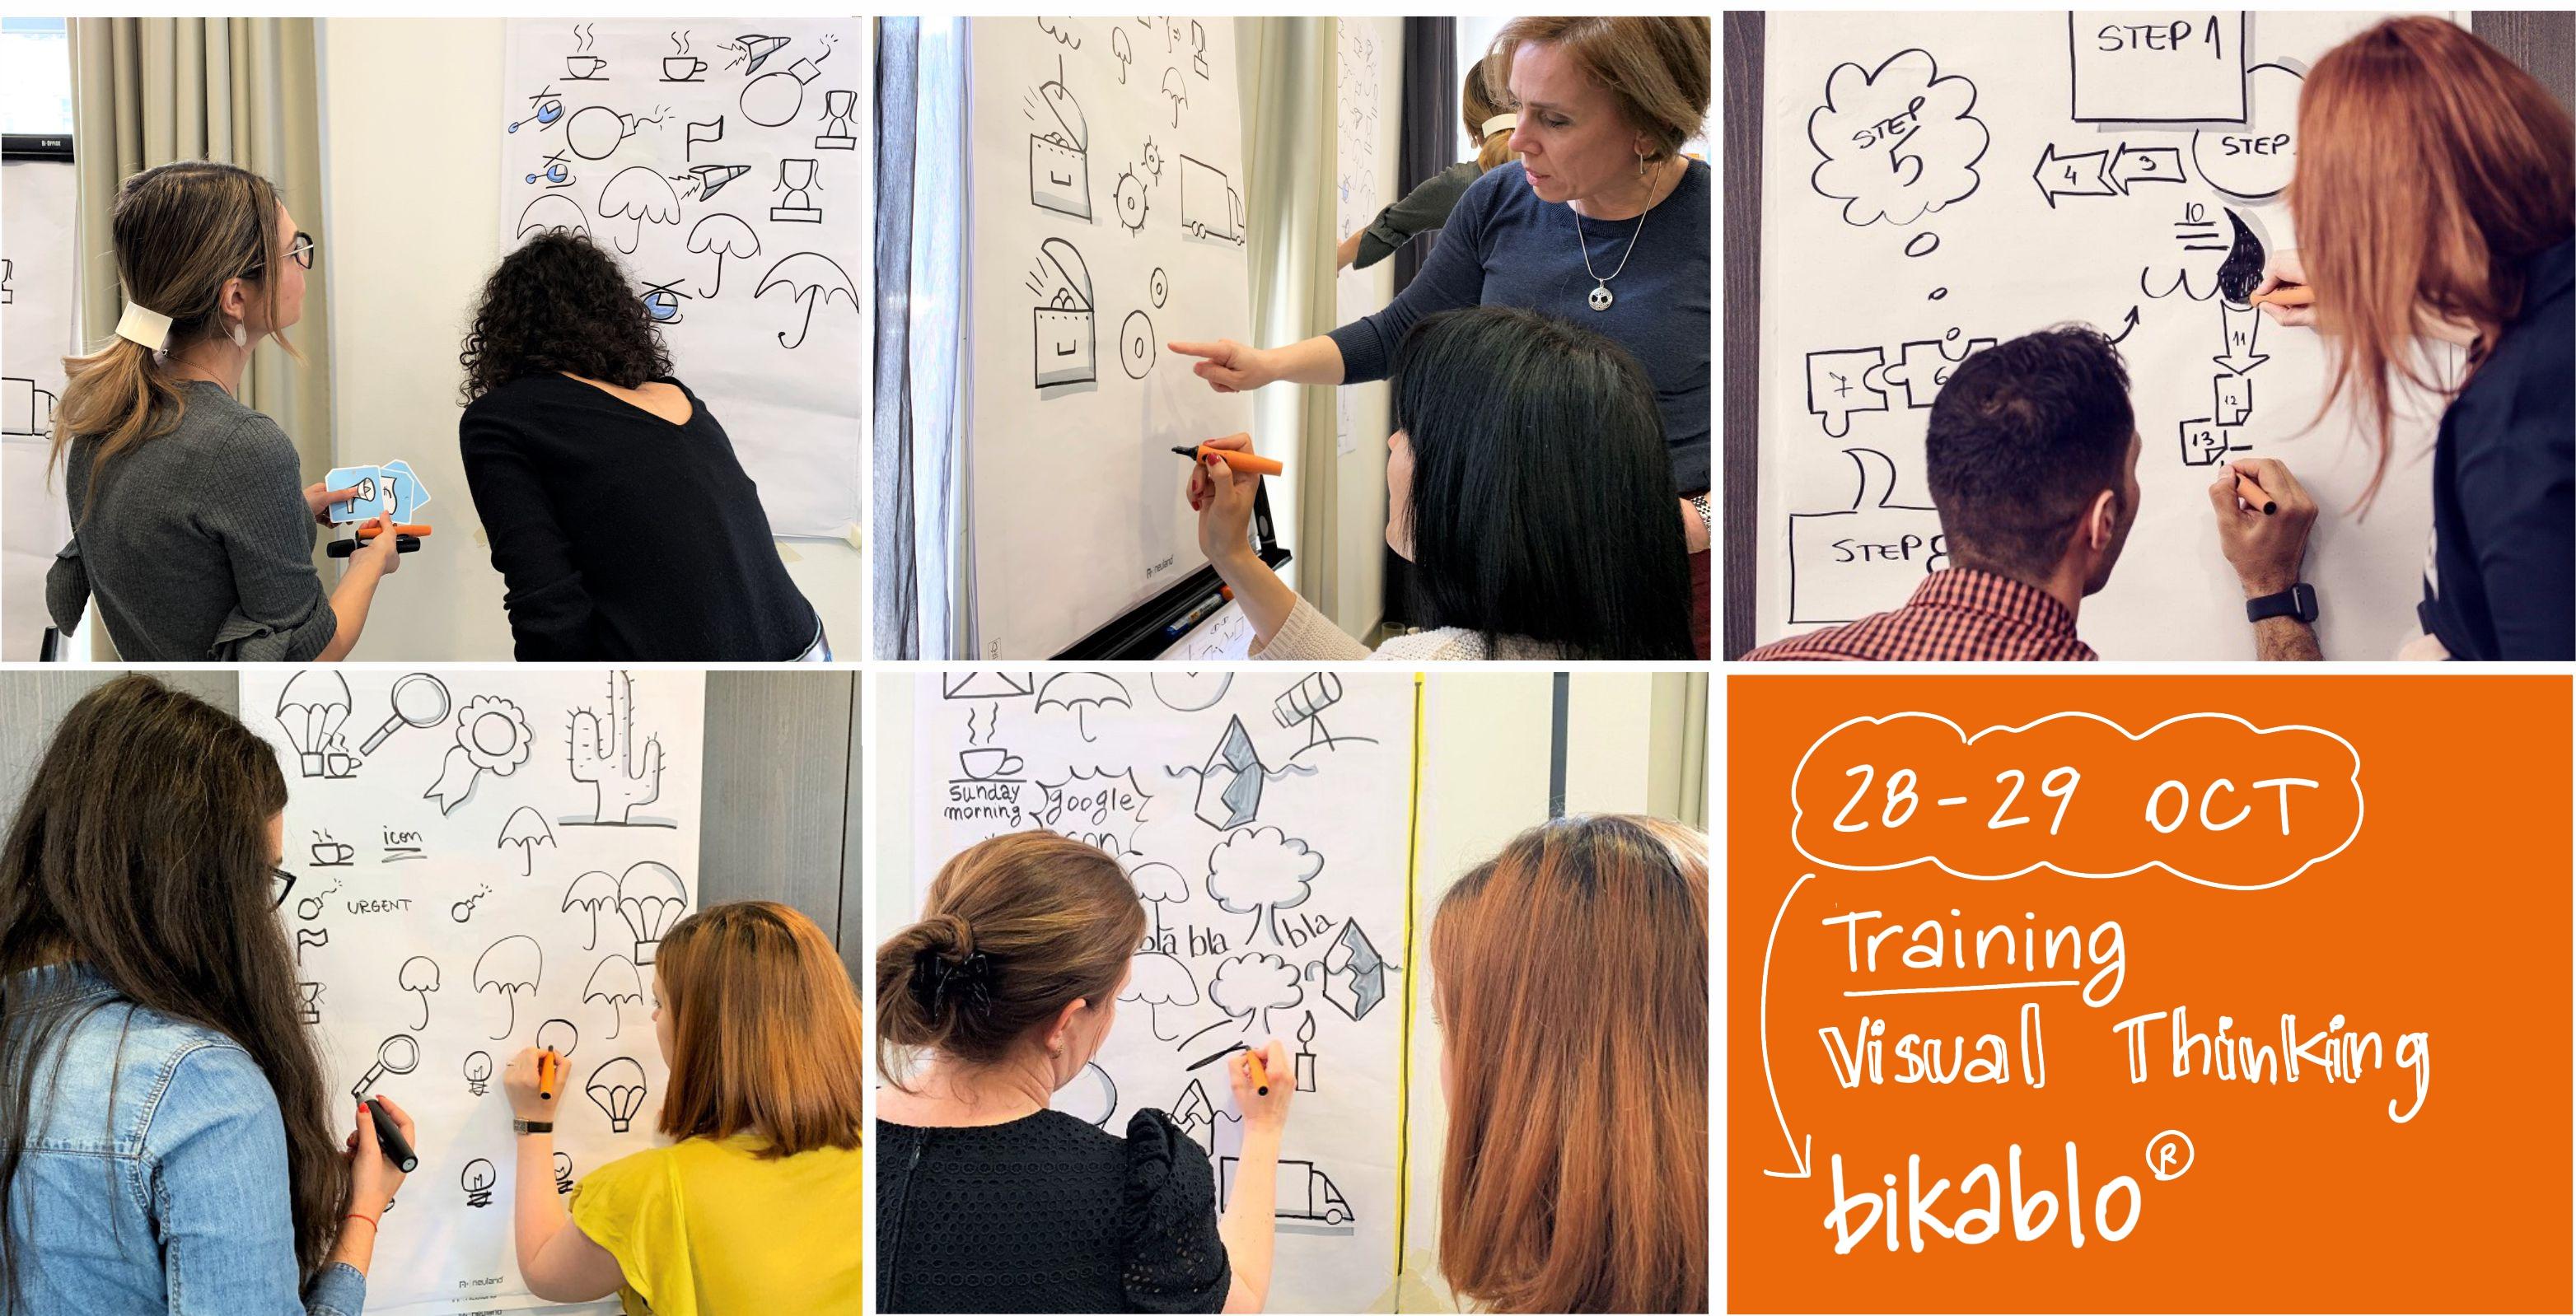 TRAINING VISUAL THINKING BIKABLO® 28 - 29 OCT